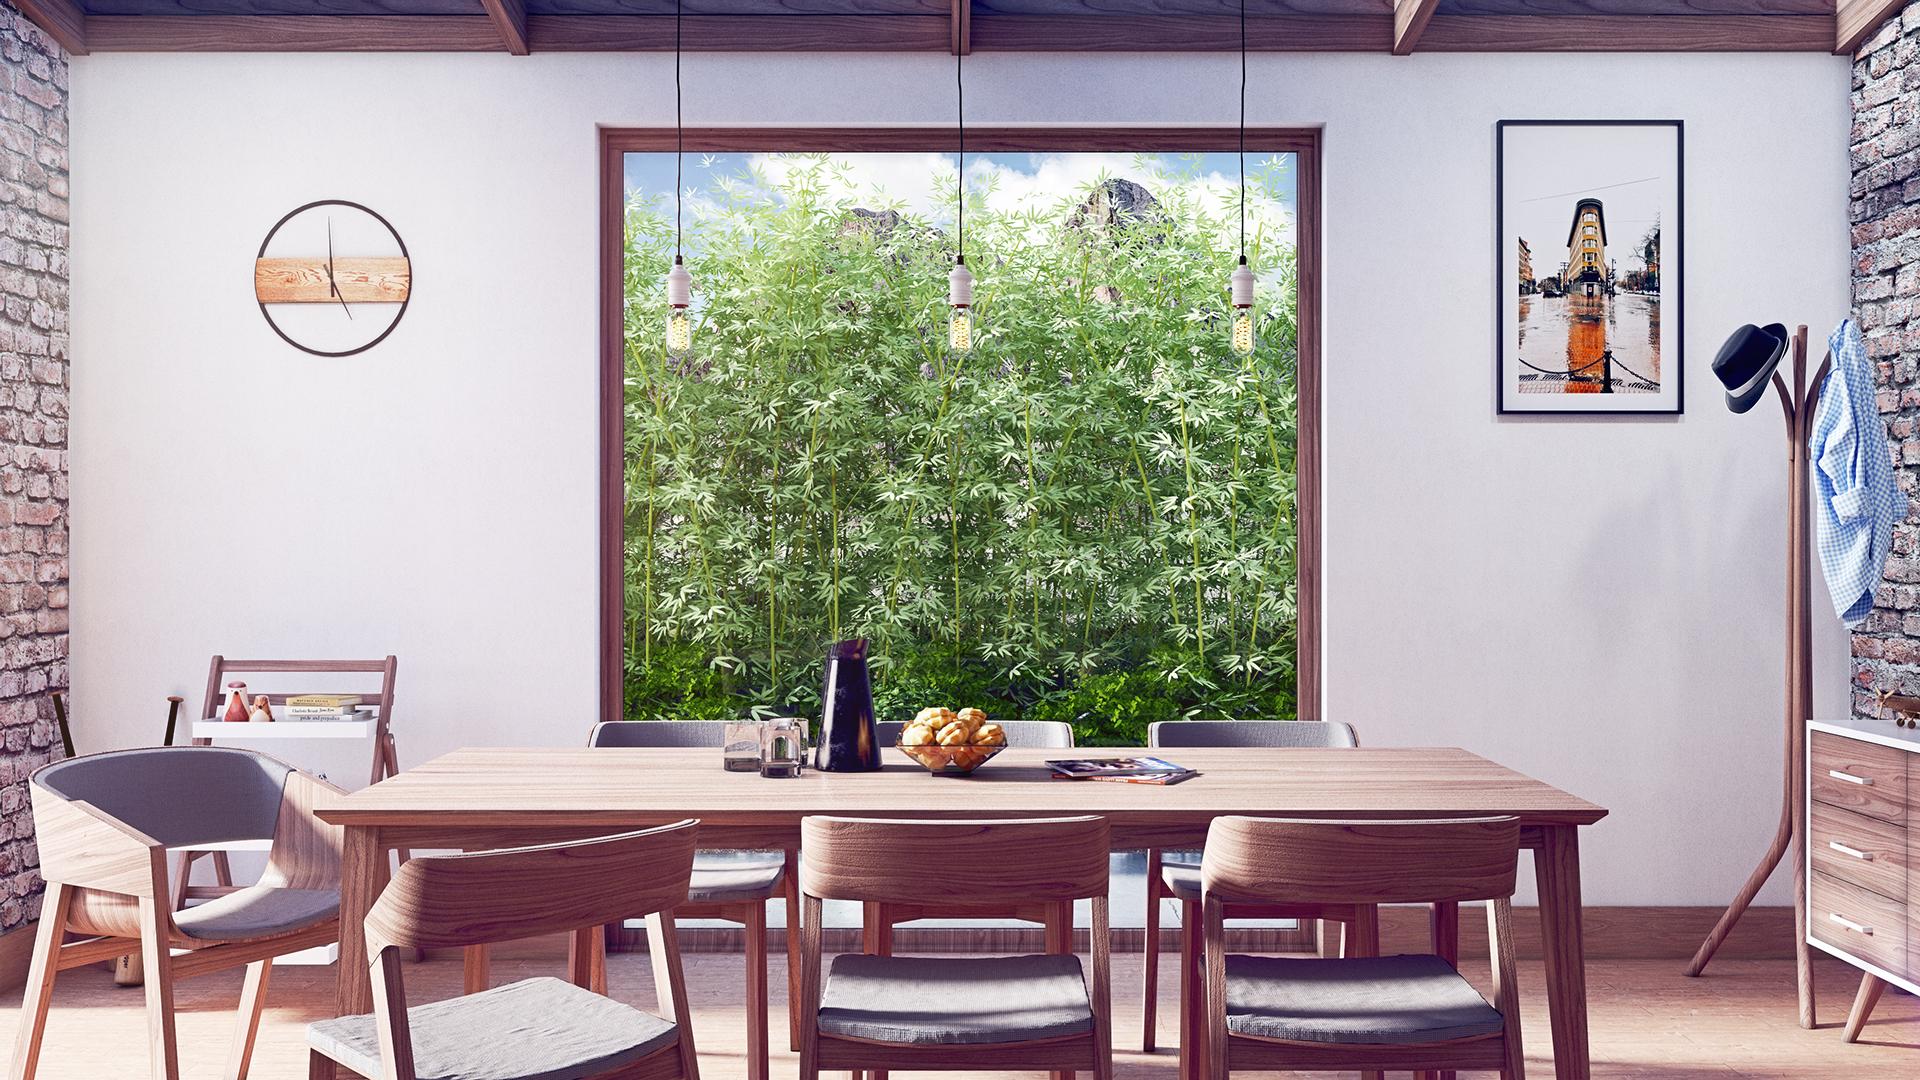 Modern Dining Room View 2 1920x1080.jpg